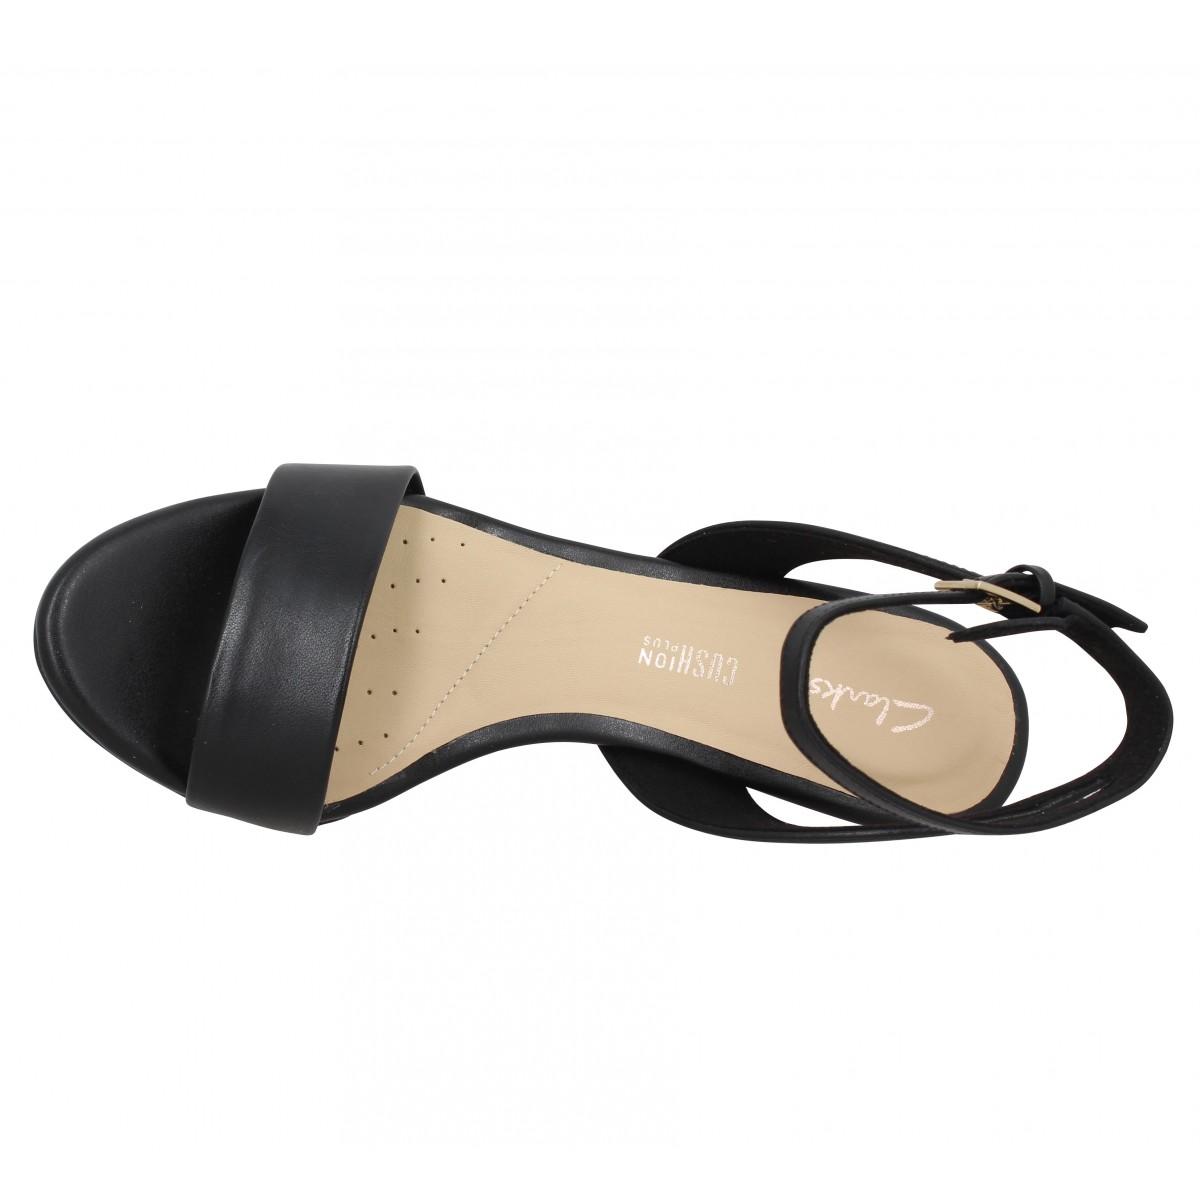 CLARKS Amali Jewel cuir Femme Noir